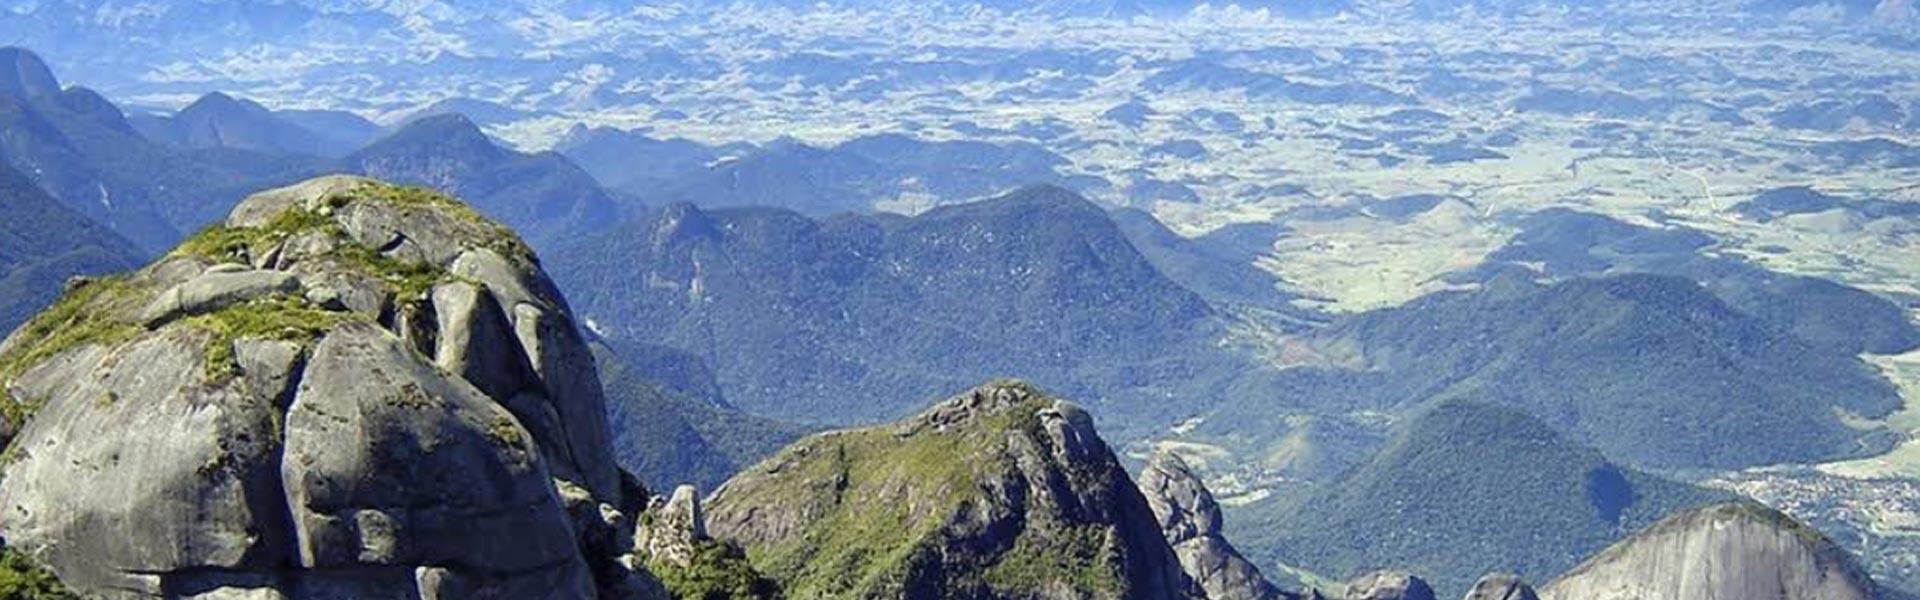 parque-nacional-da-serra-dos-orgaos-01